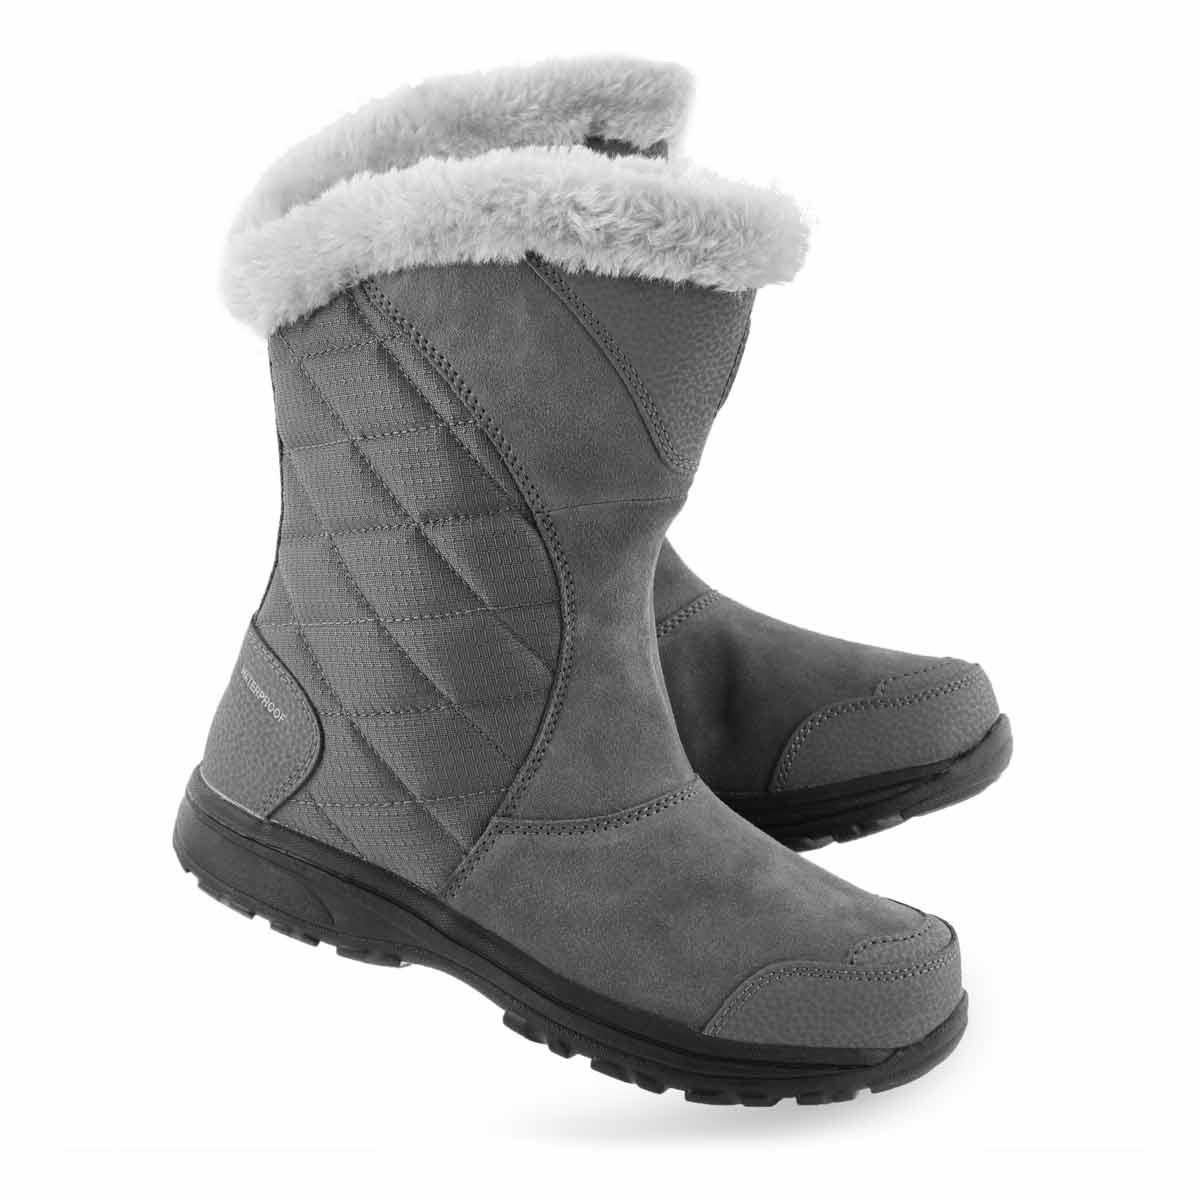 Lds Ice Maiden II Slip grey winter boot